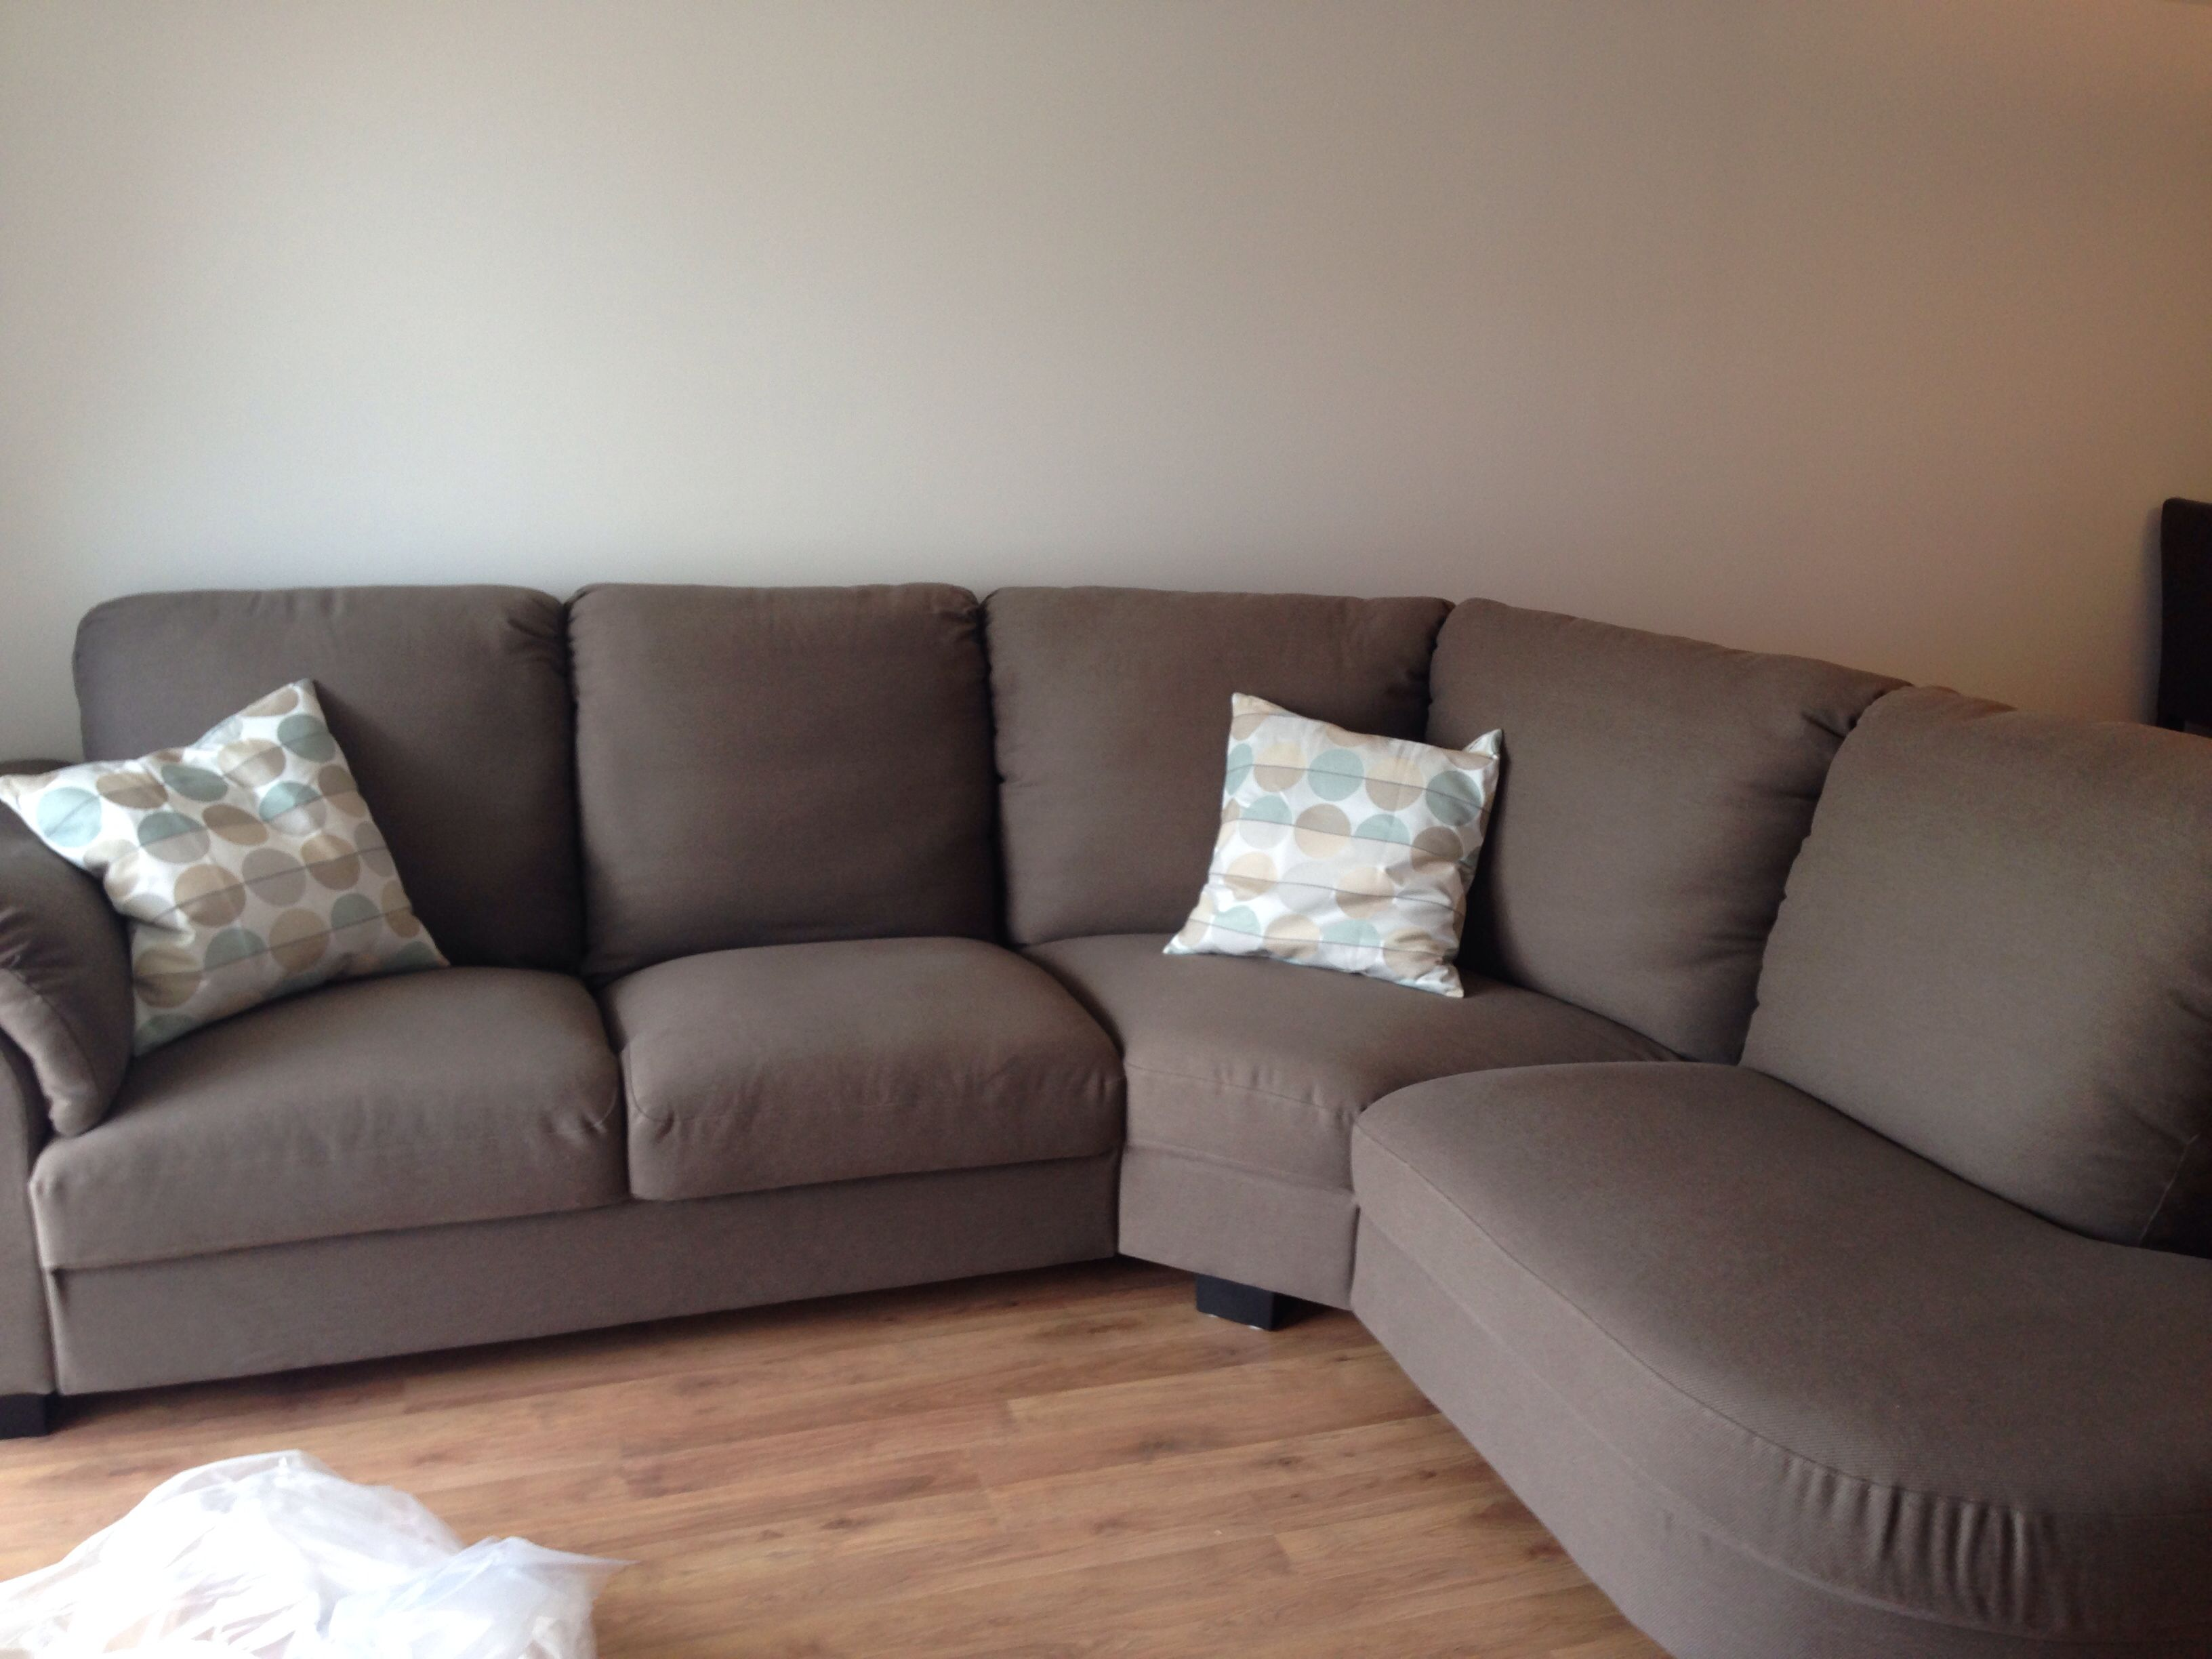 New Sofa Ikea Tidafors Living